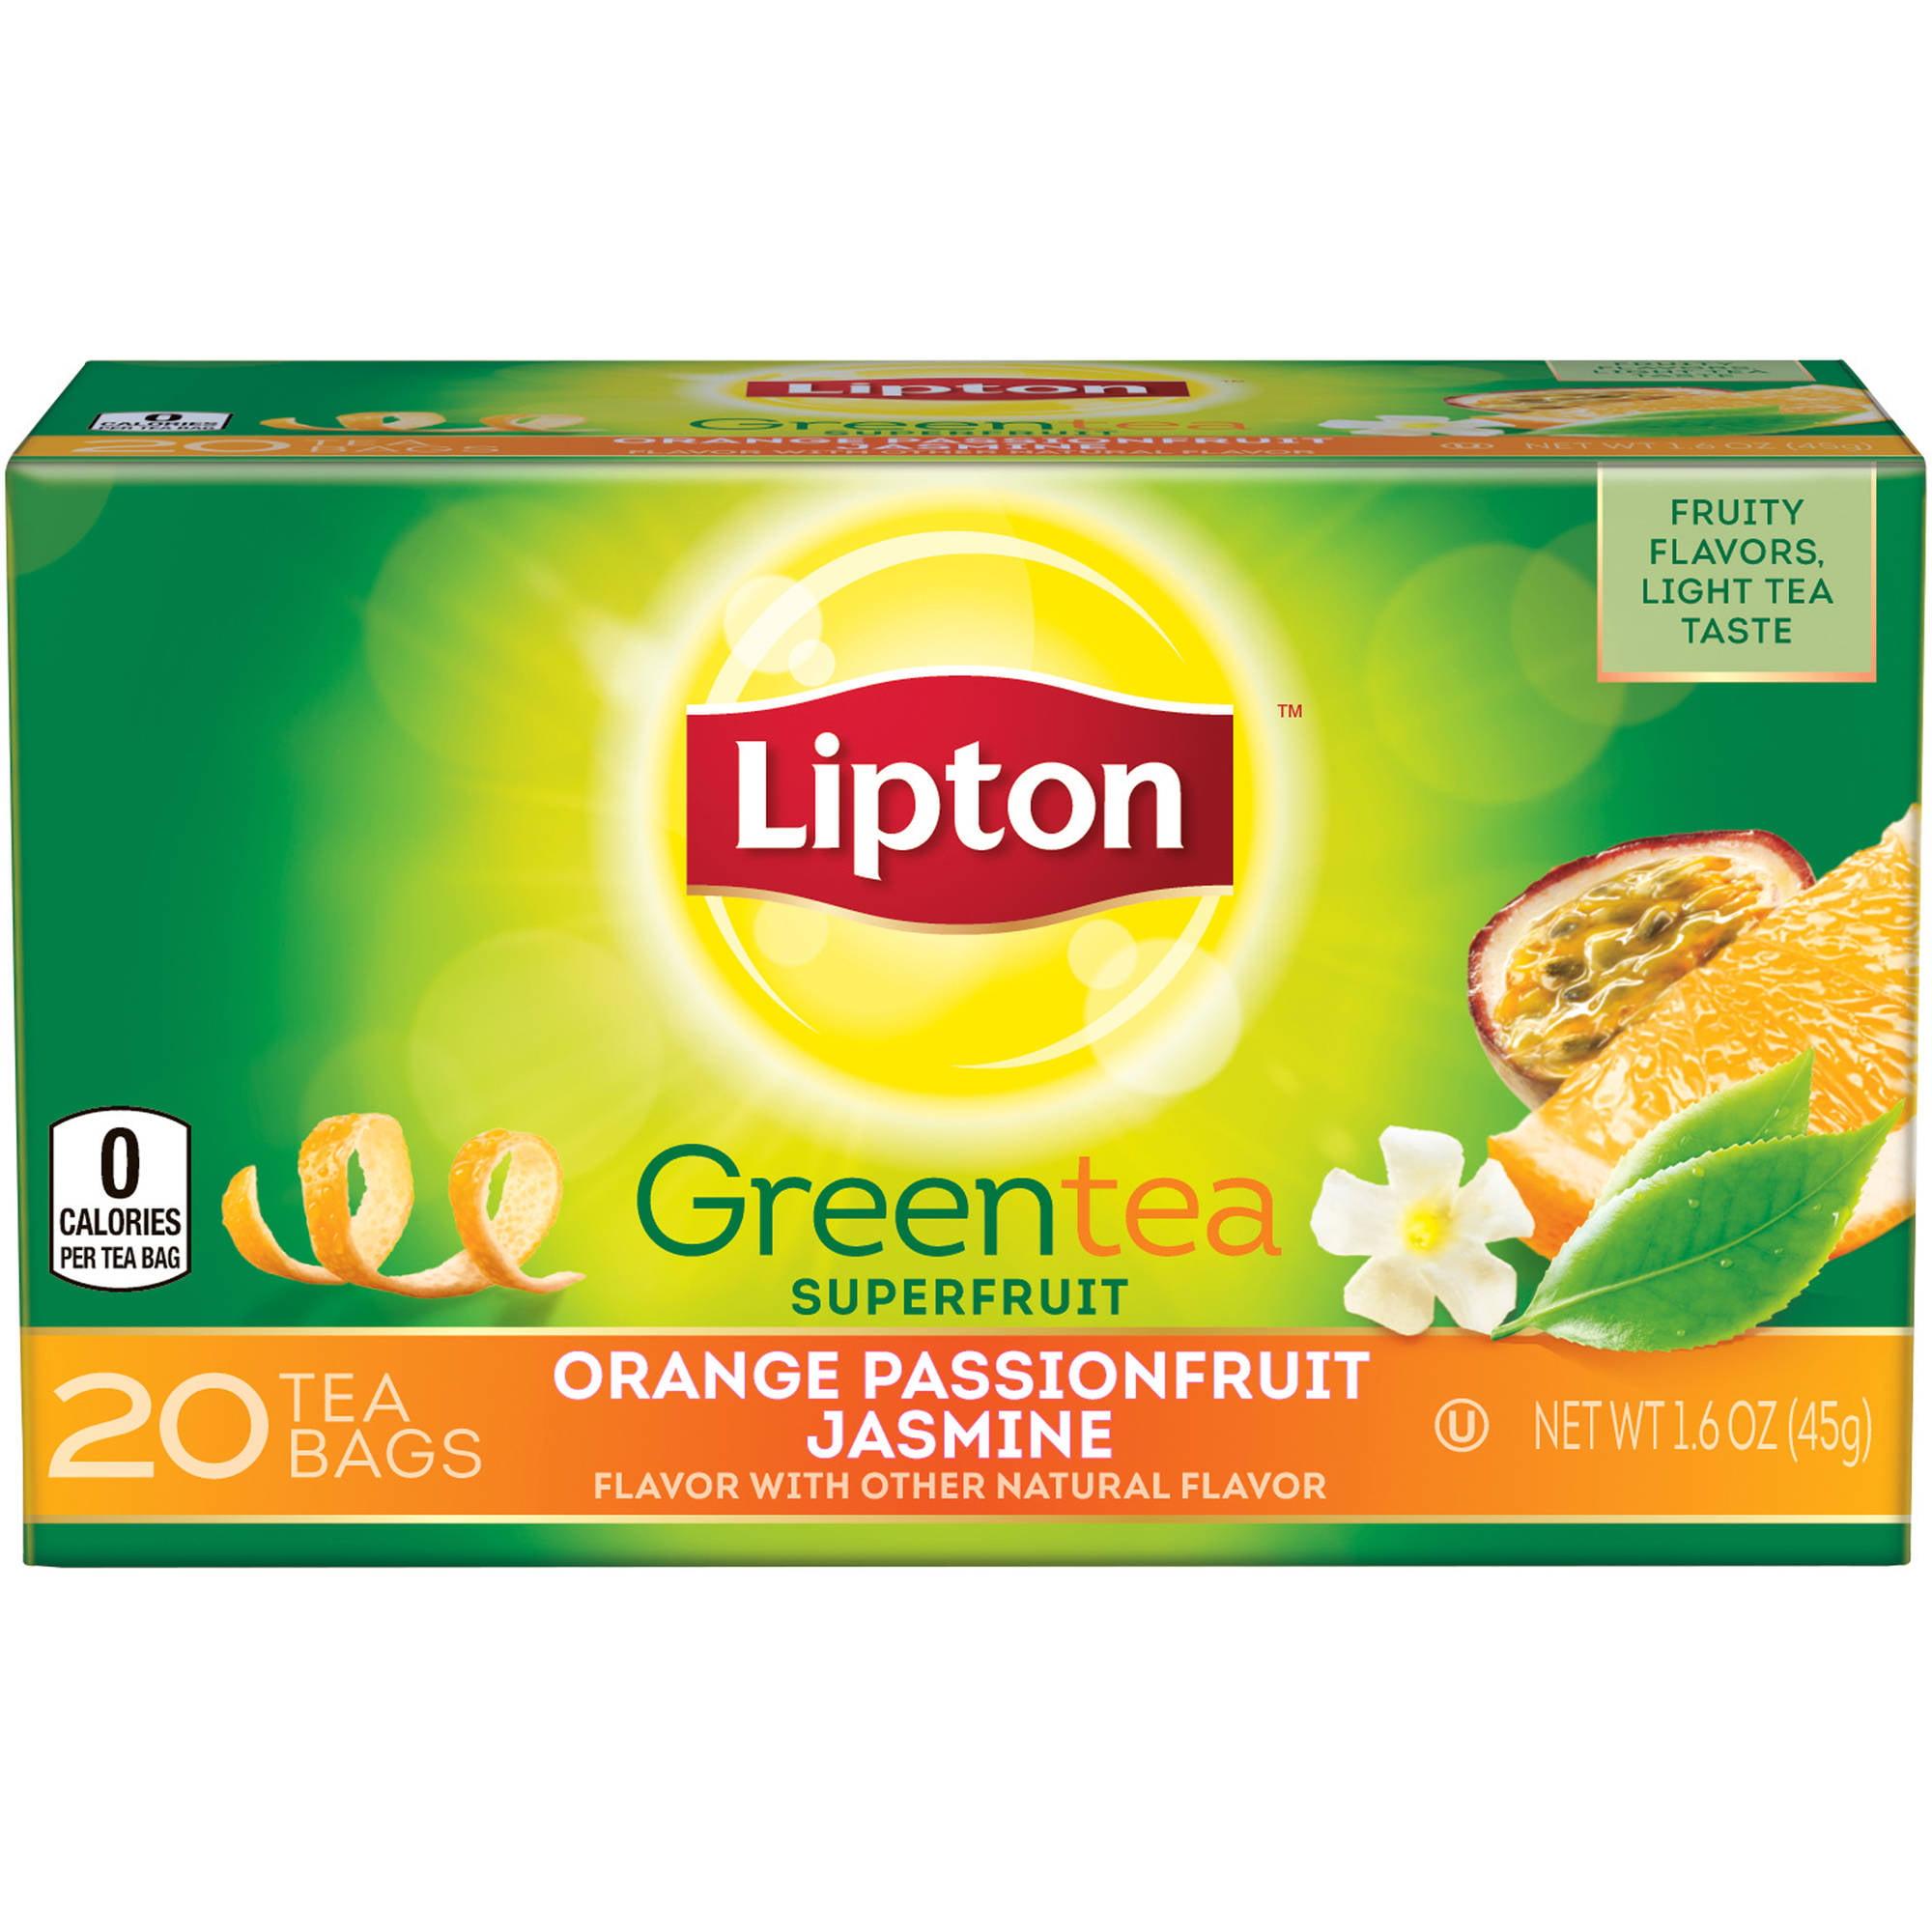 Lipton Orange Passionfruit Jasmine Green Tea, 20 ct